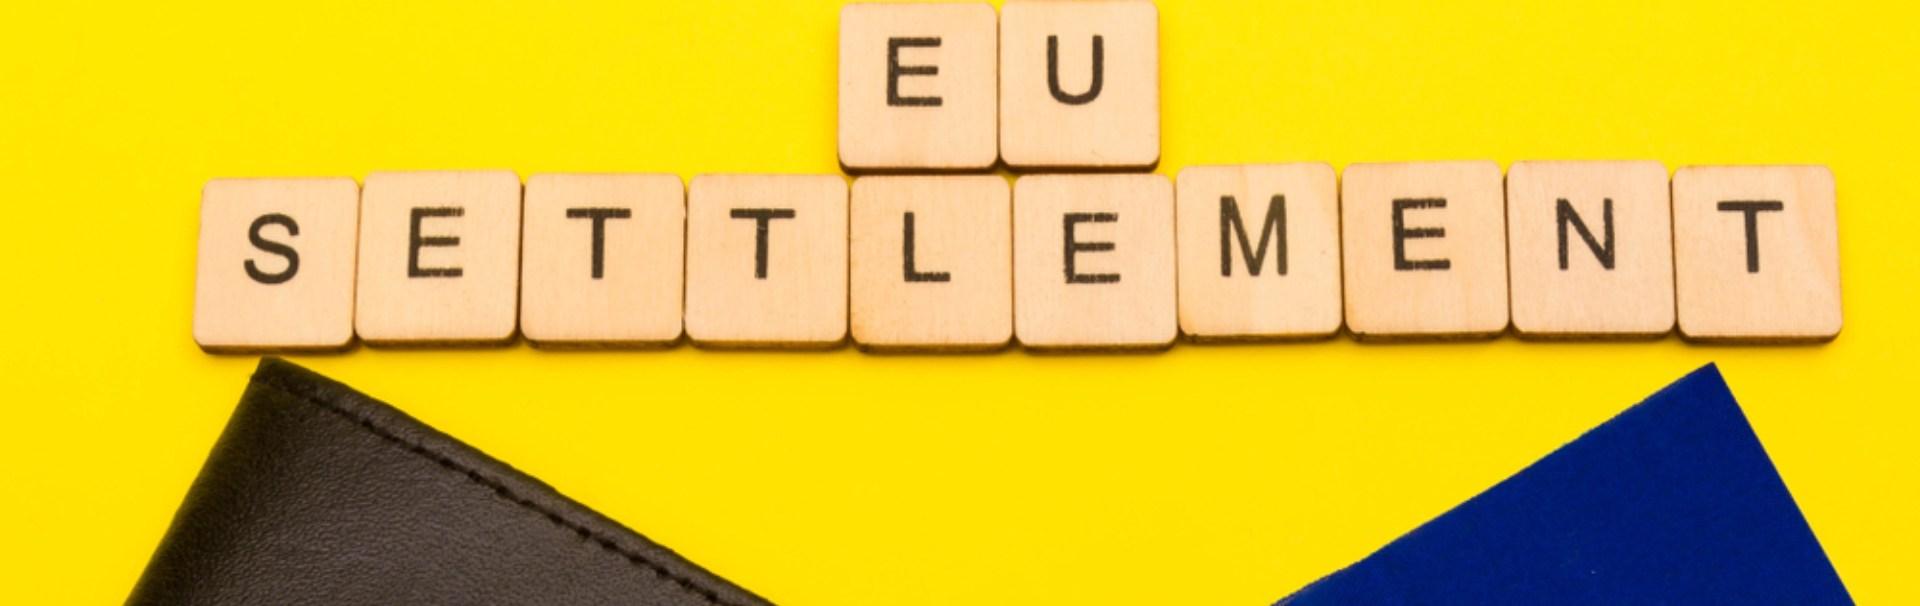 EU Settlement Scheme banner written out in scrabble letters